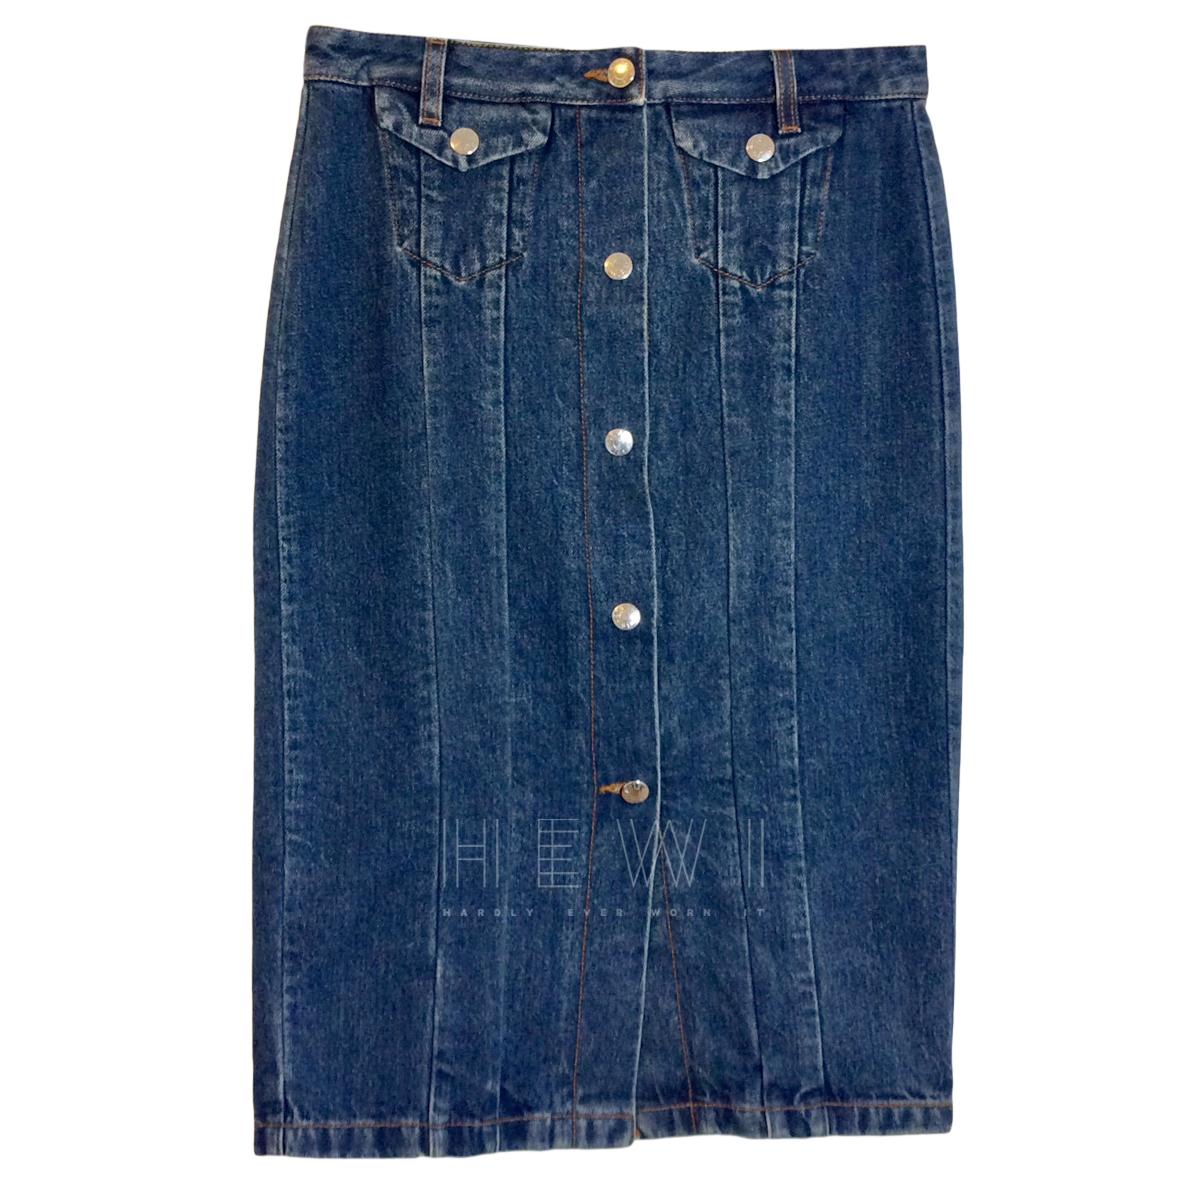 Acne Studios Blue Denim Pencil Skirt